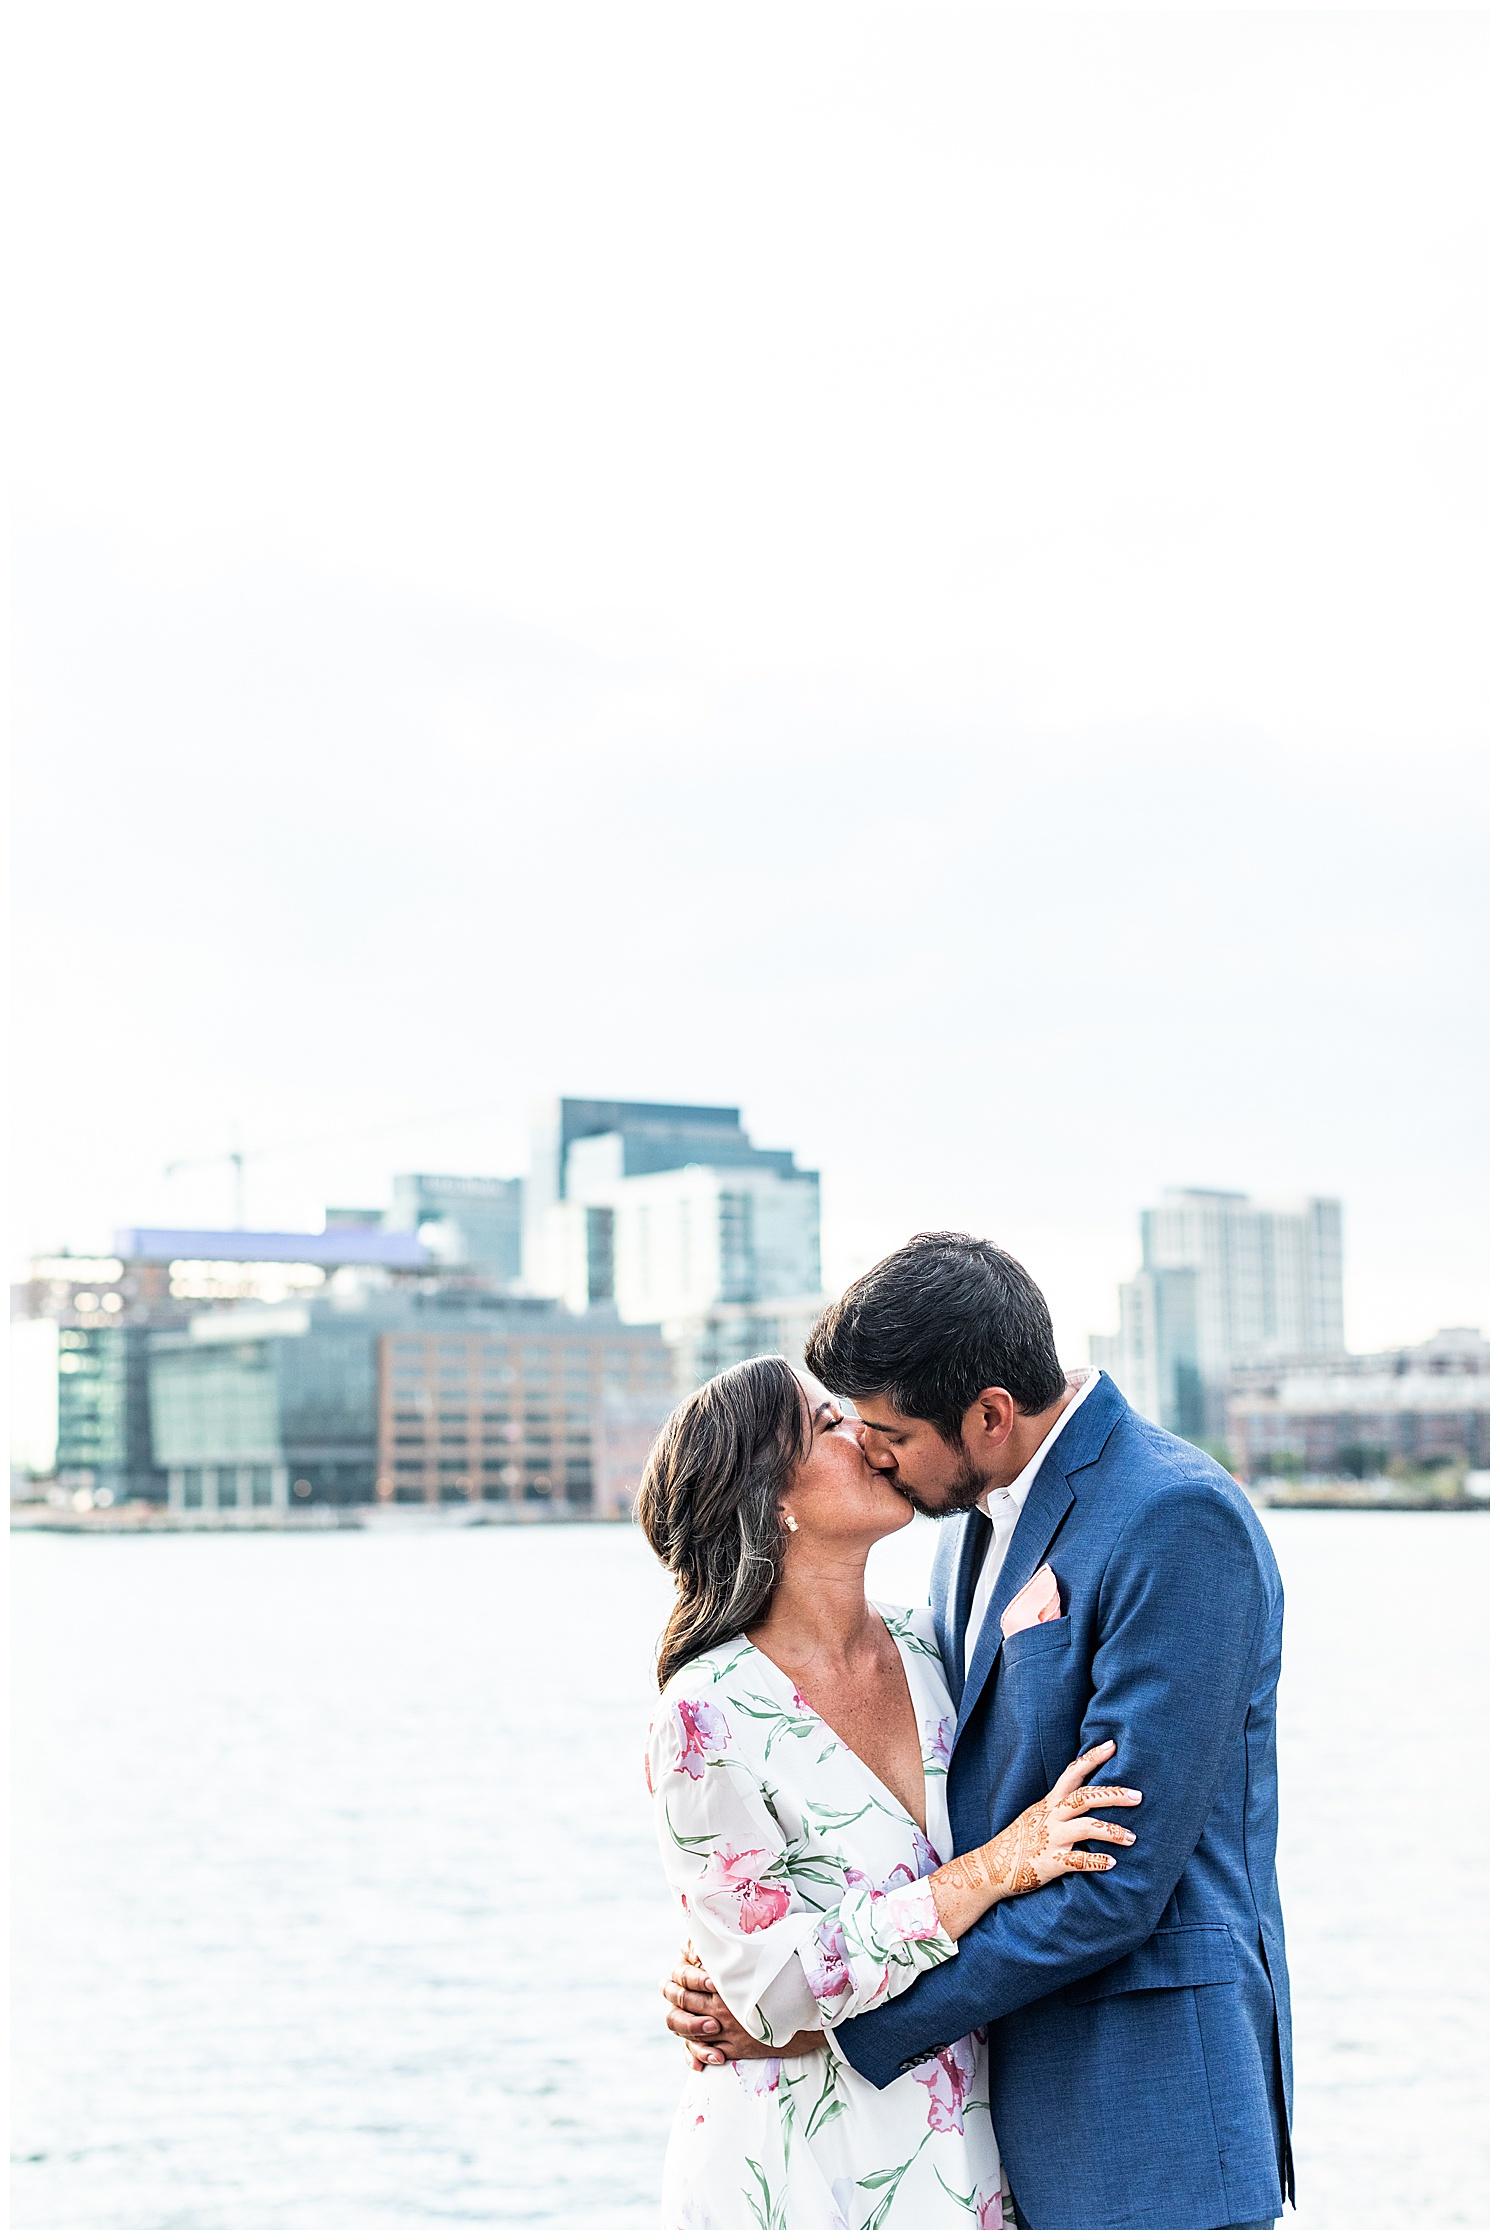 Shantanu Maria Locust Point Engagement Session Living Radiant Photography_0023.jpg